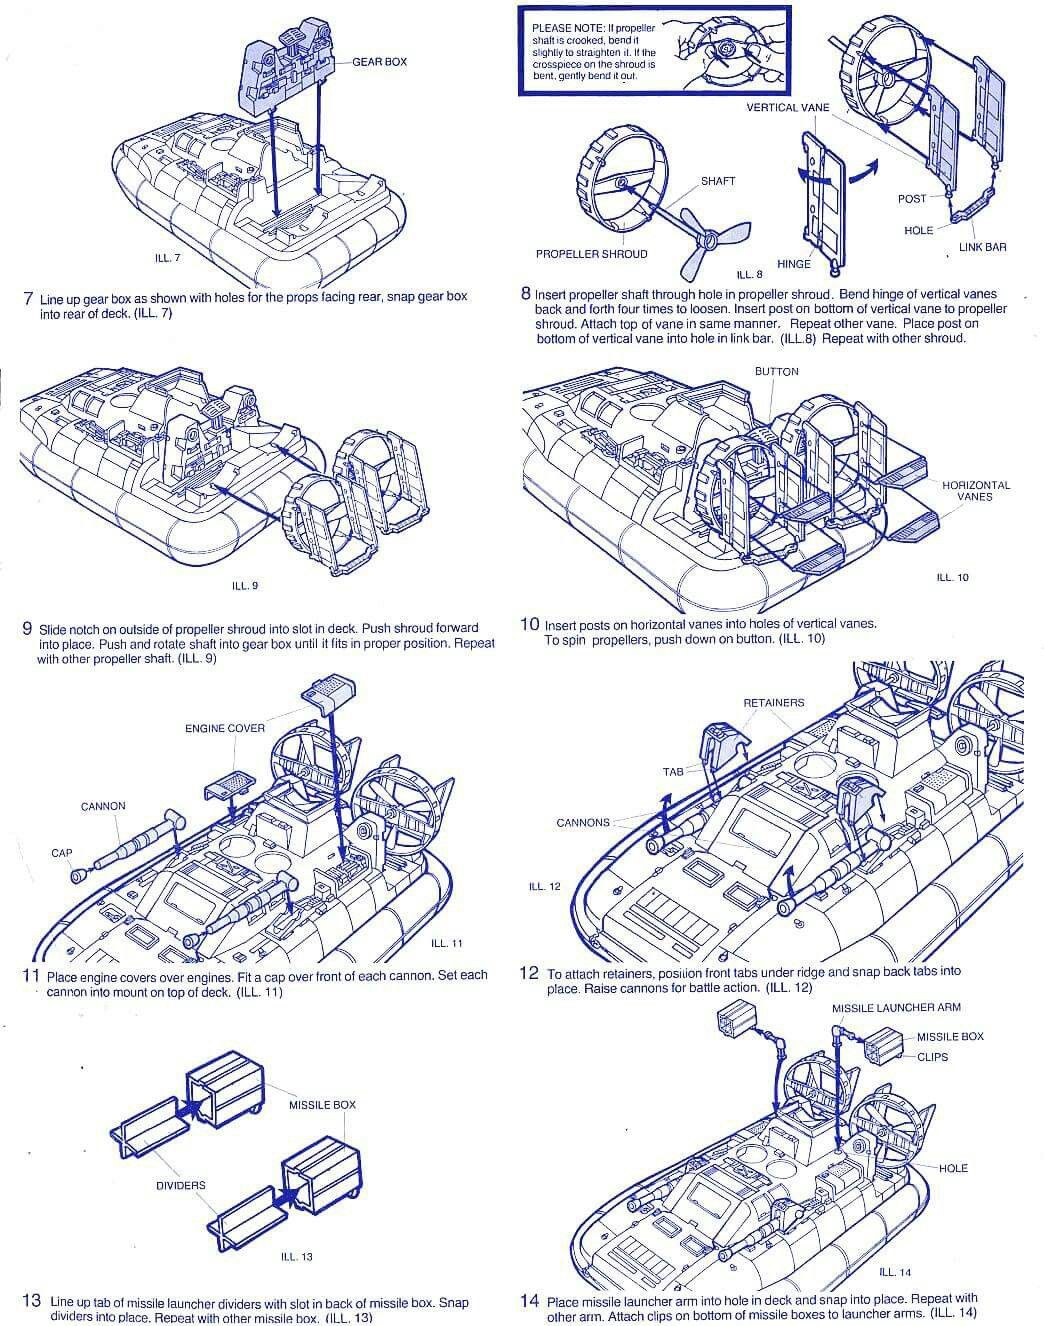 Pin by James Berry on gi joe blueprints | Gi joe, Big toy